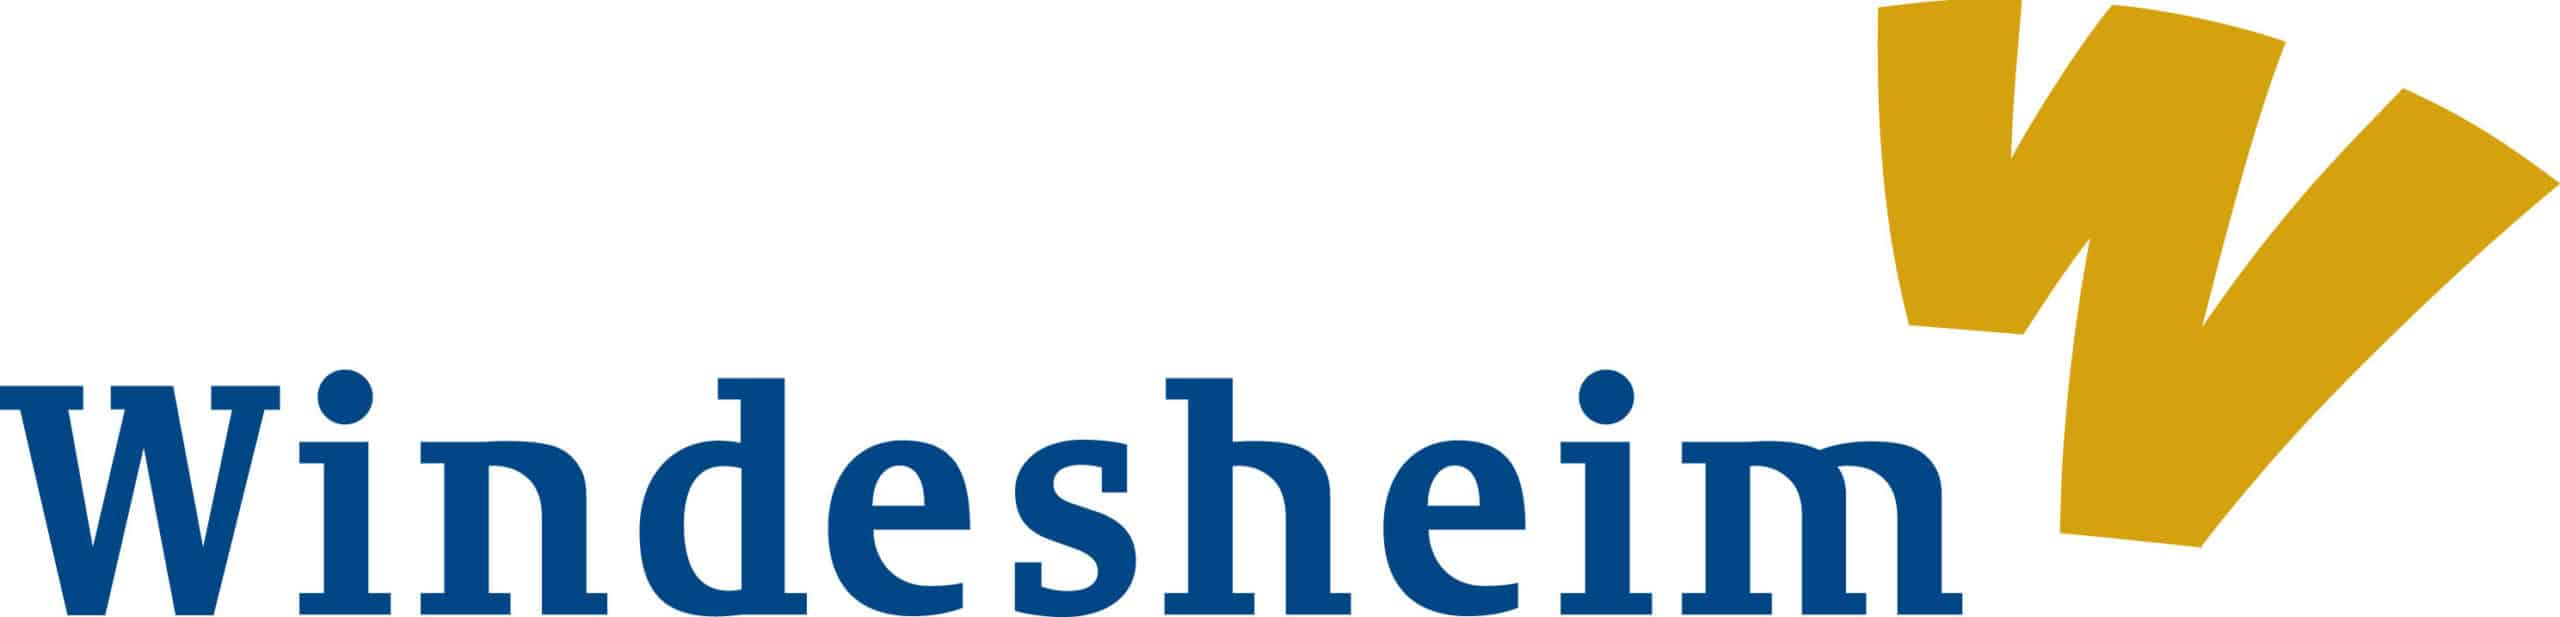 Windesheim-logo-1-scaled